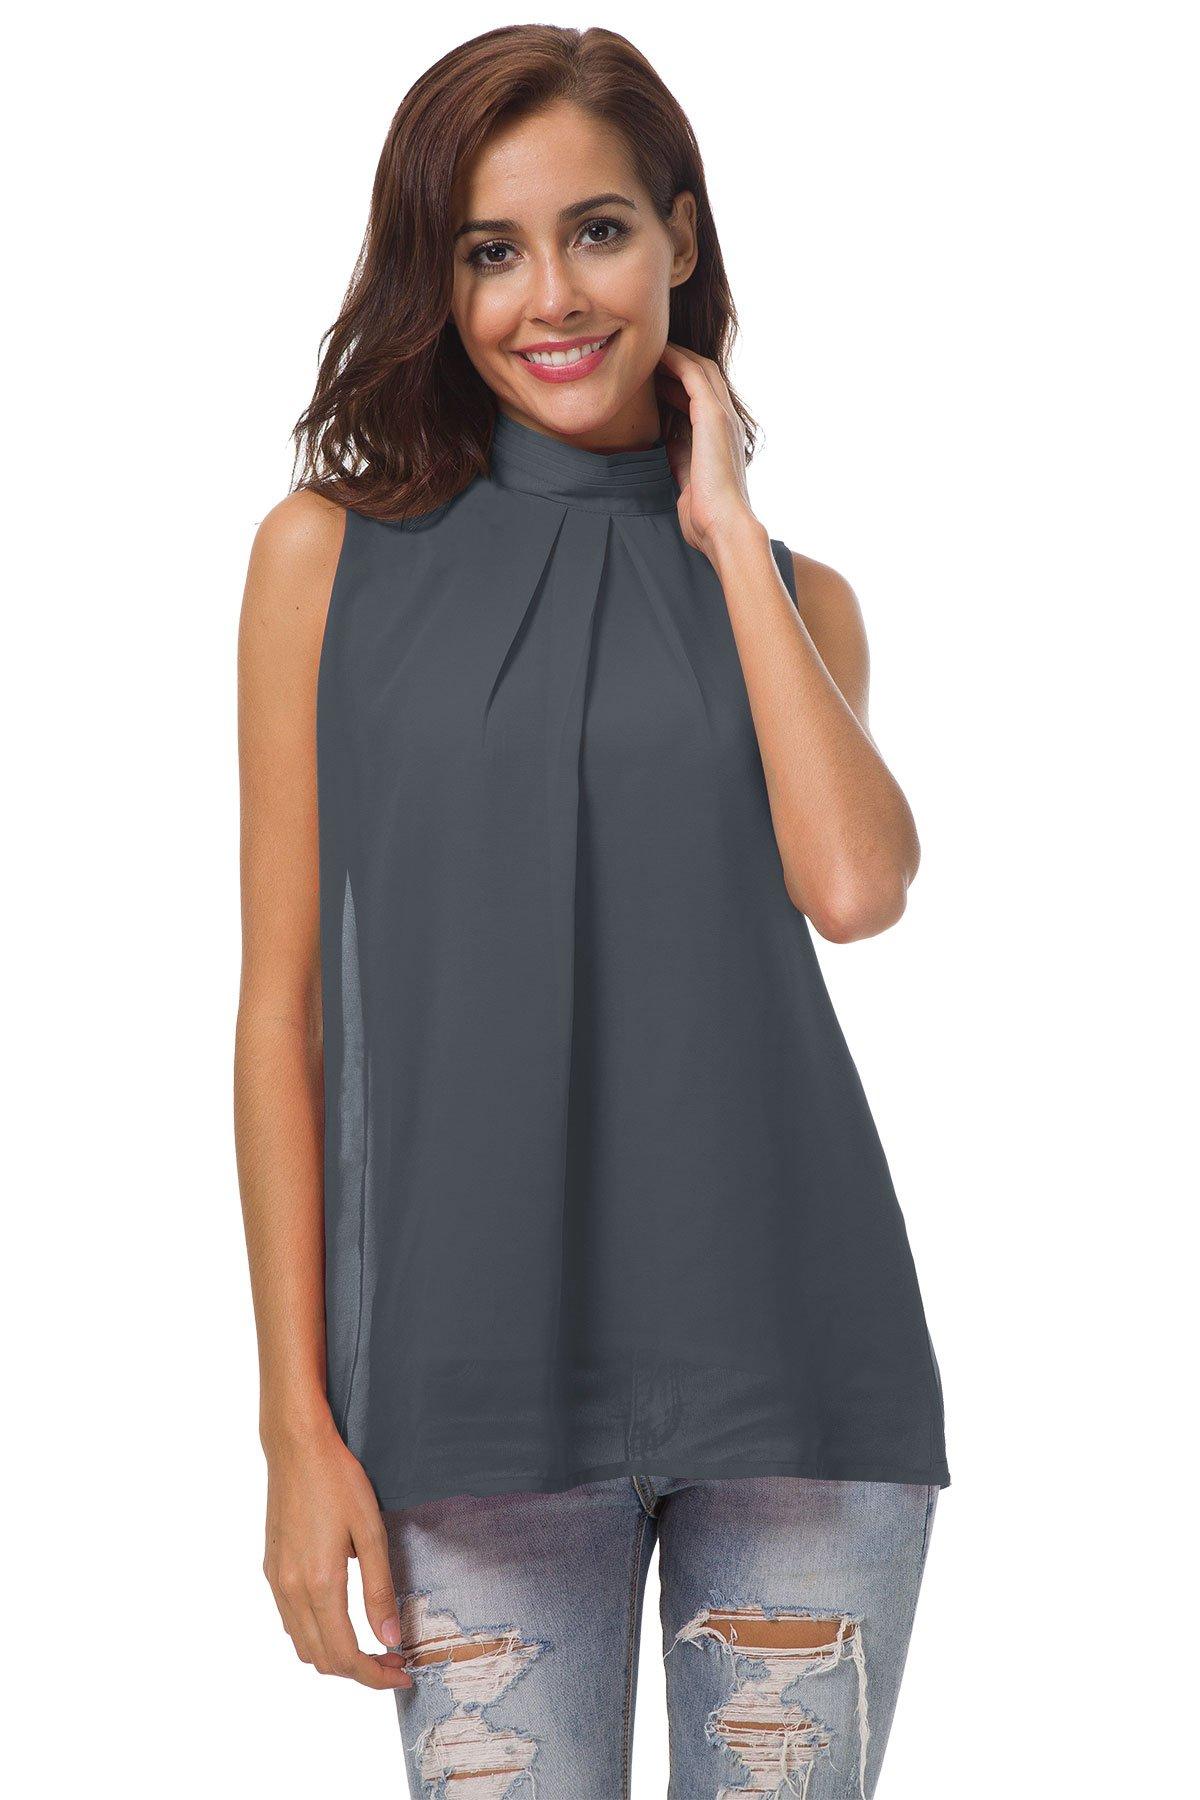 SRYSHKR Summer Chiffon Sleeveless Shirt Top Blouse Tank Camis Women Casual Double Layer Pleated Female (L, Dark Grey)